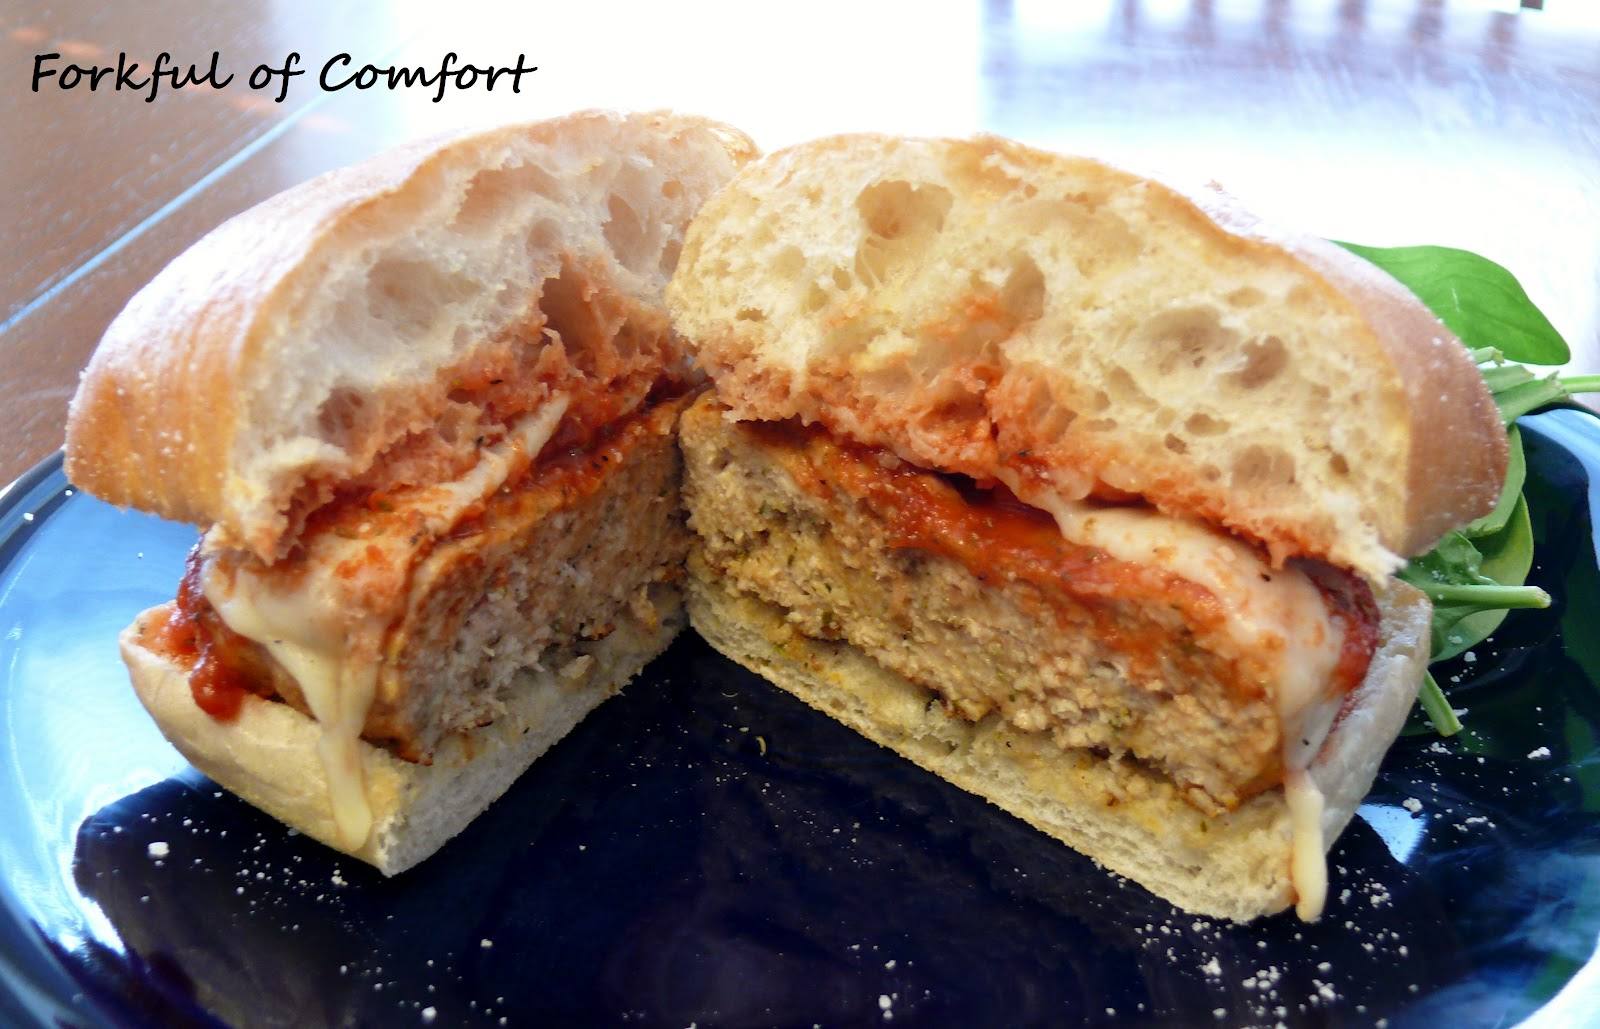 Forkful of Comfort: Chicken Parmesan Burgers